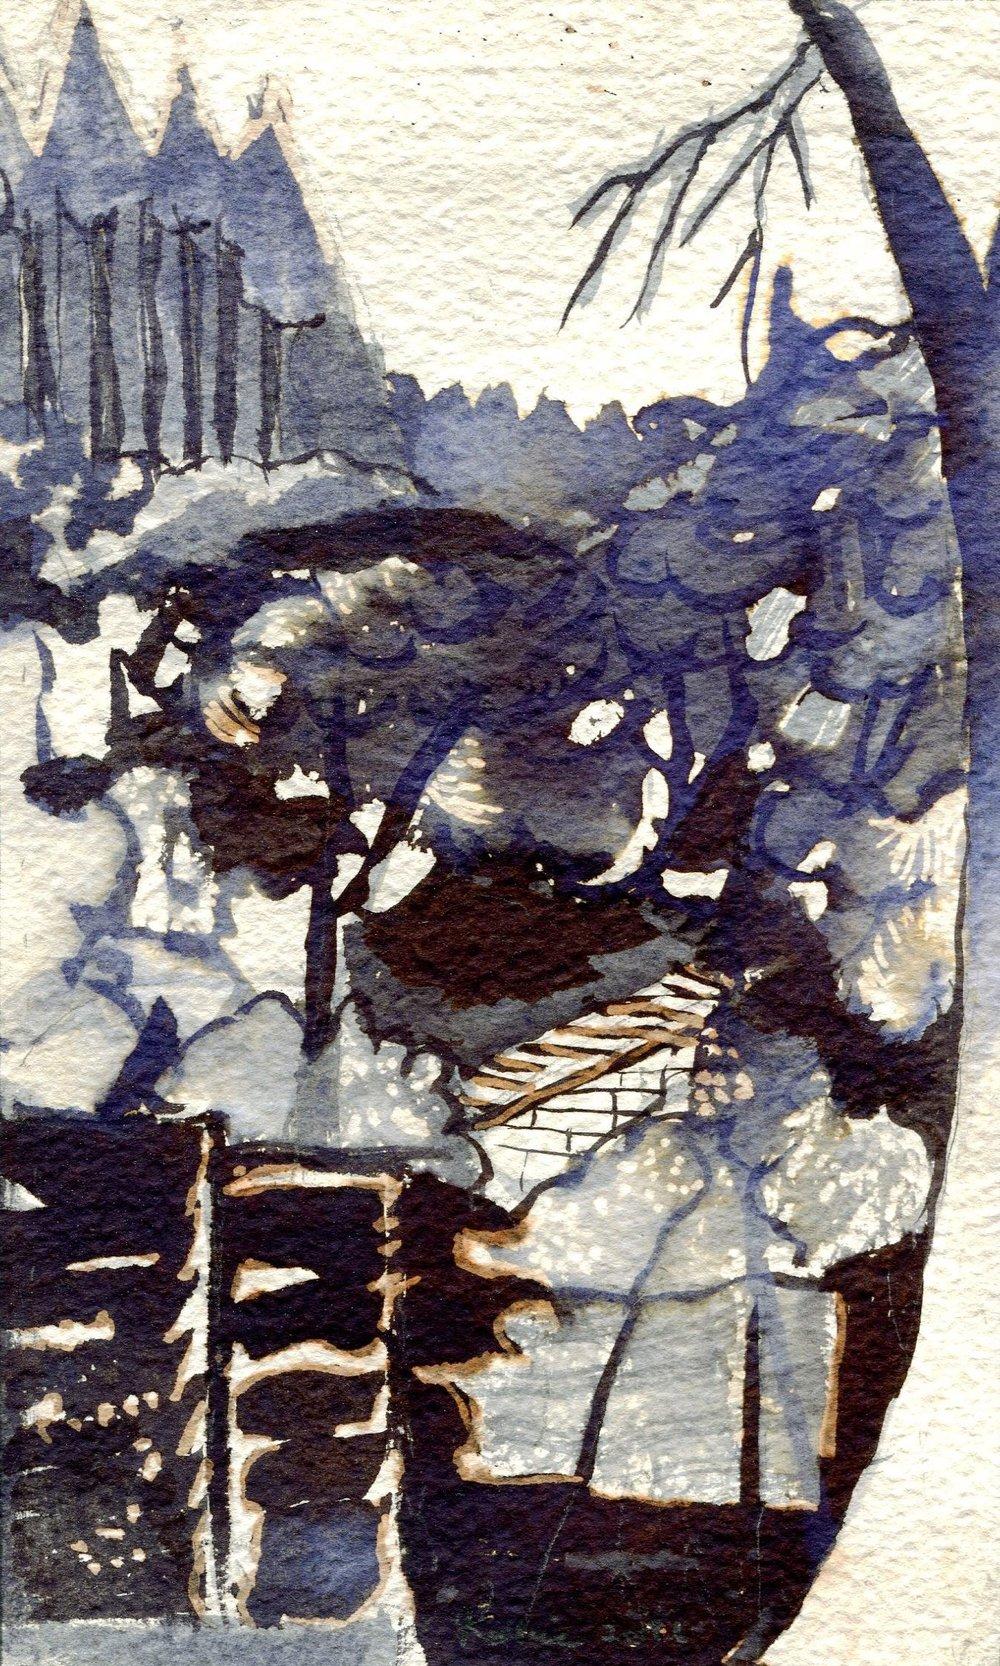 92b Kobie Venter, Blackridge 2, Ink & bleach on paper